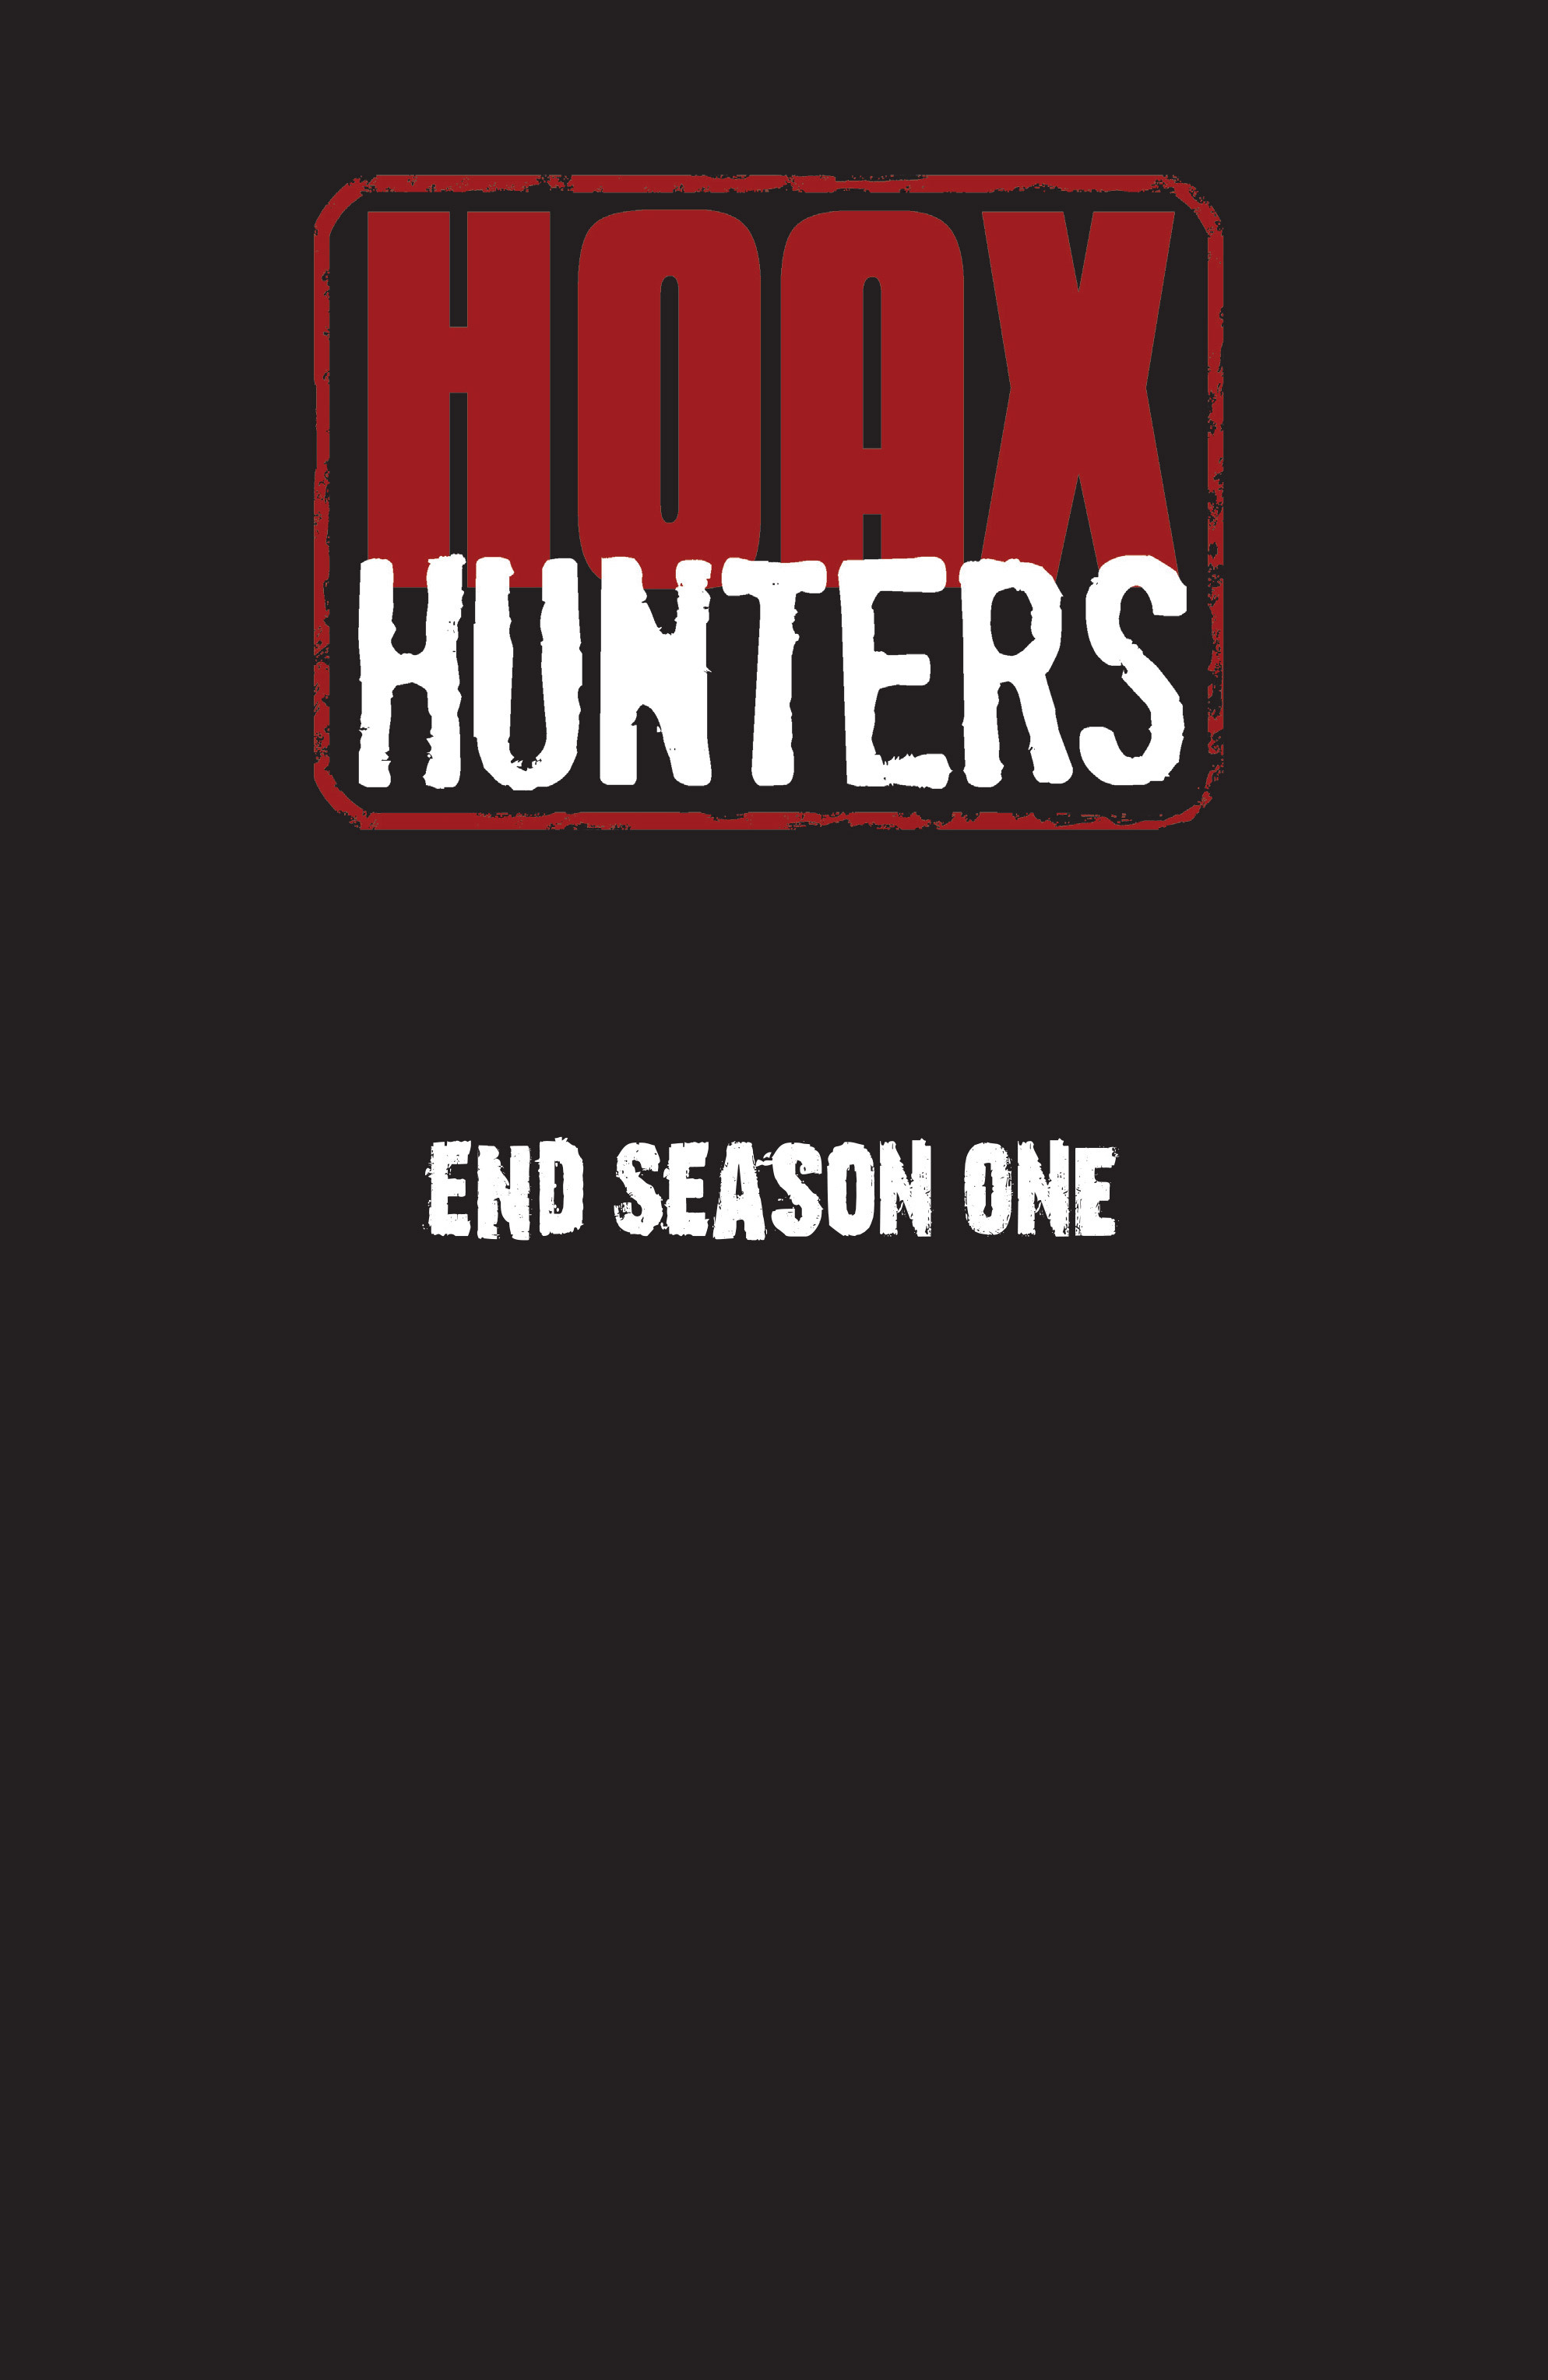 Read online Hoax Hunters (2012) comic -  Issue # TPB 3 - 101